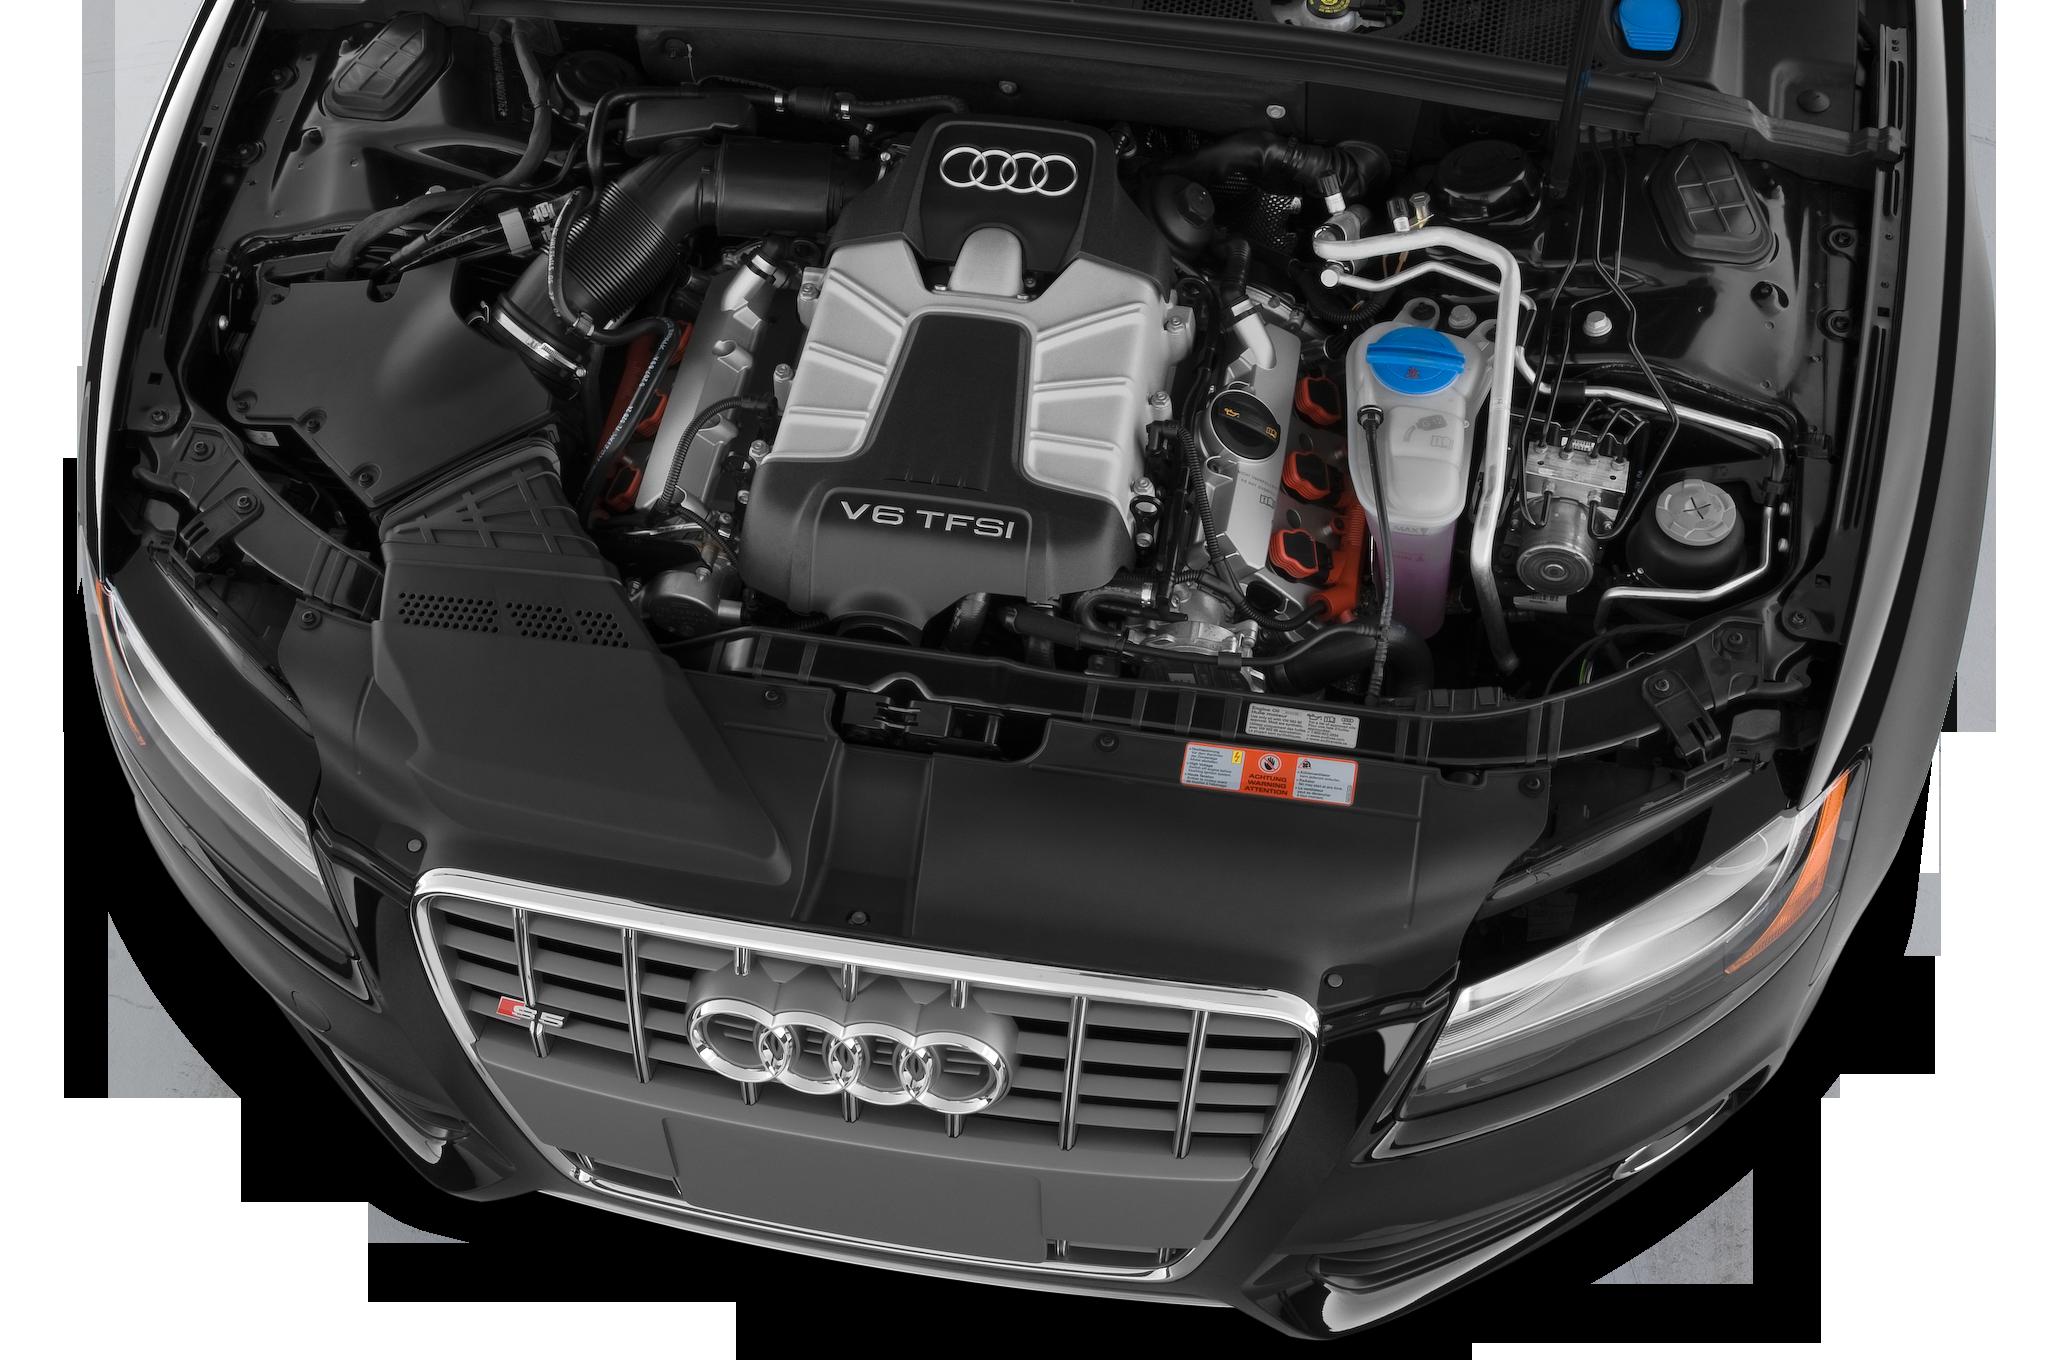 2010 Audi S5 Cabriolet Audi Luxury Sport Convertible